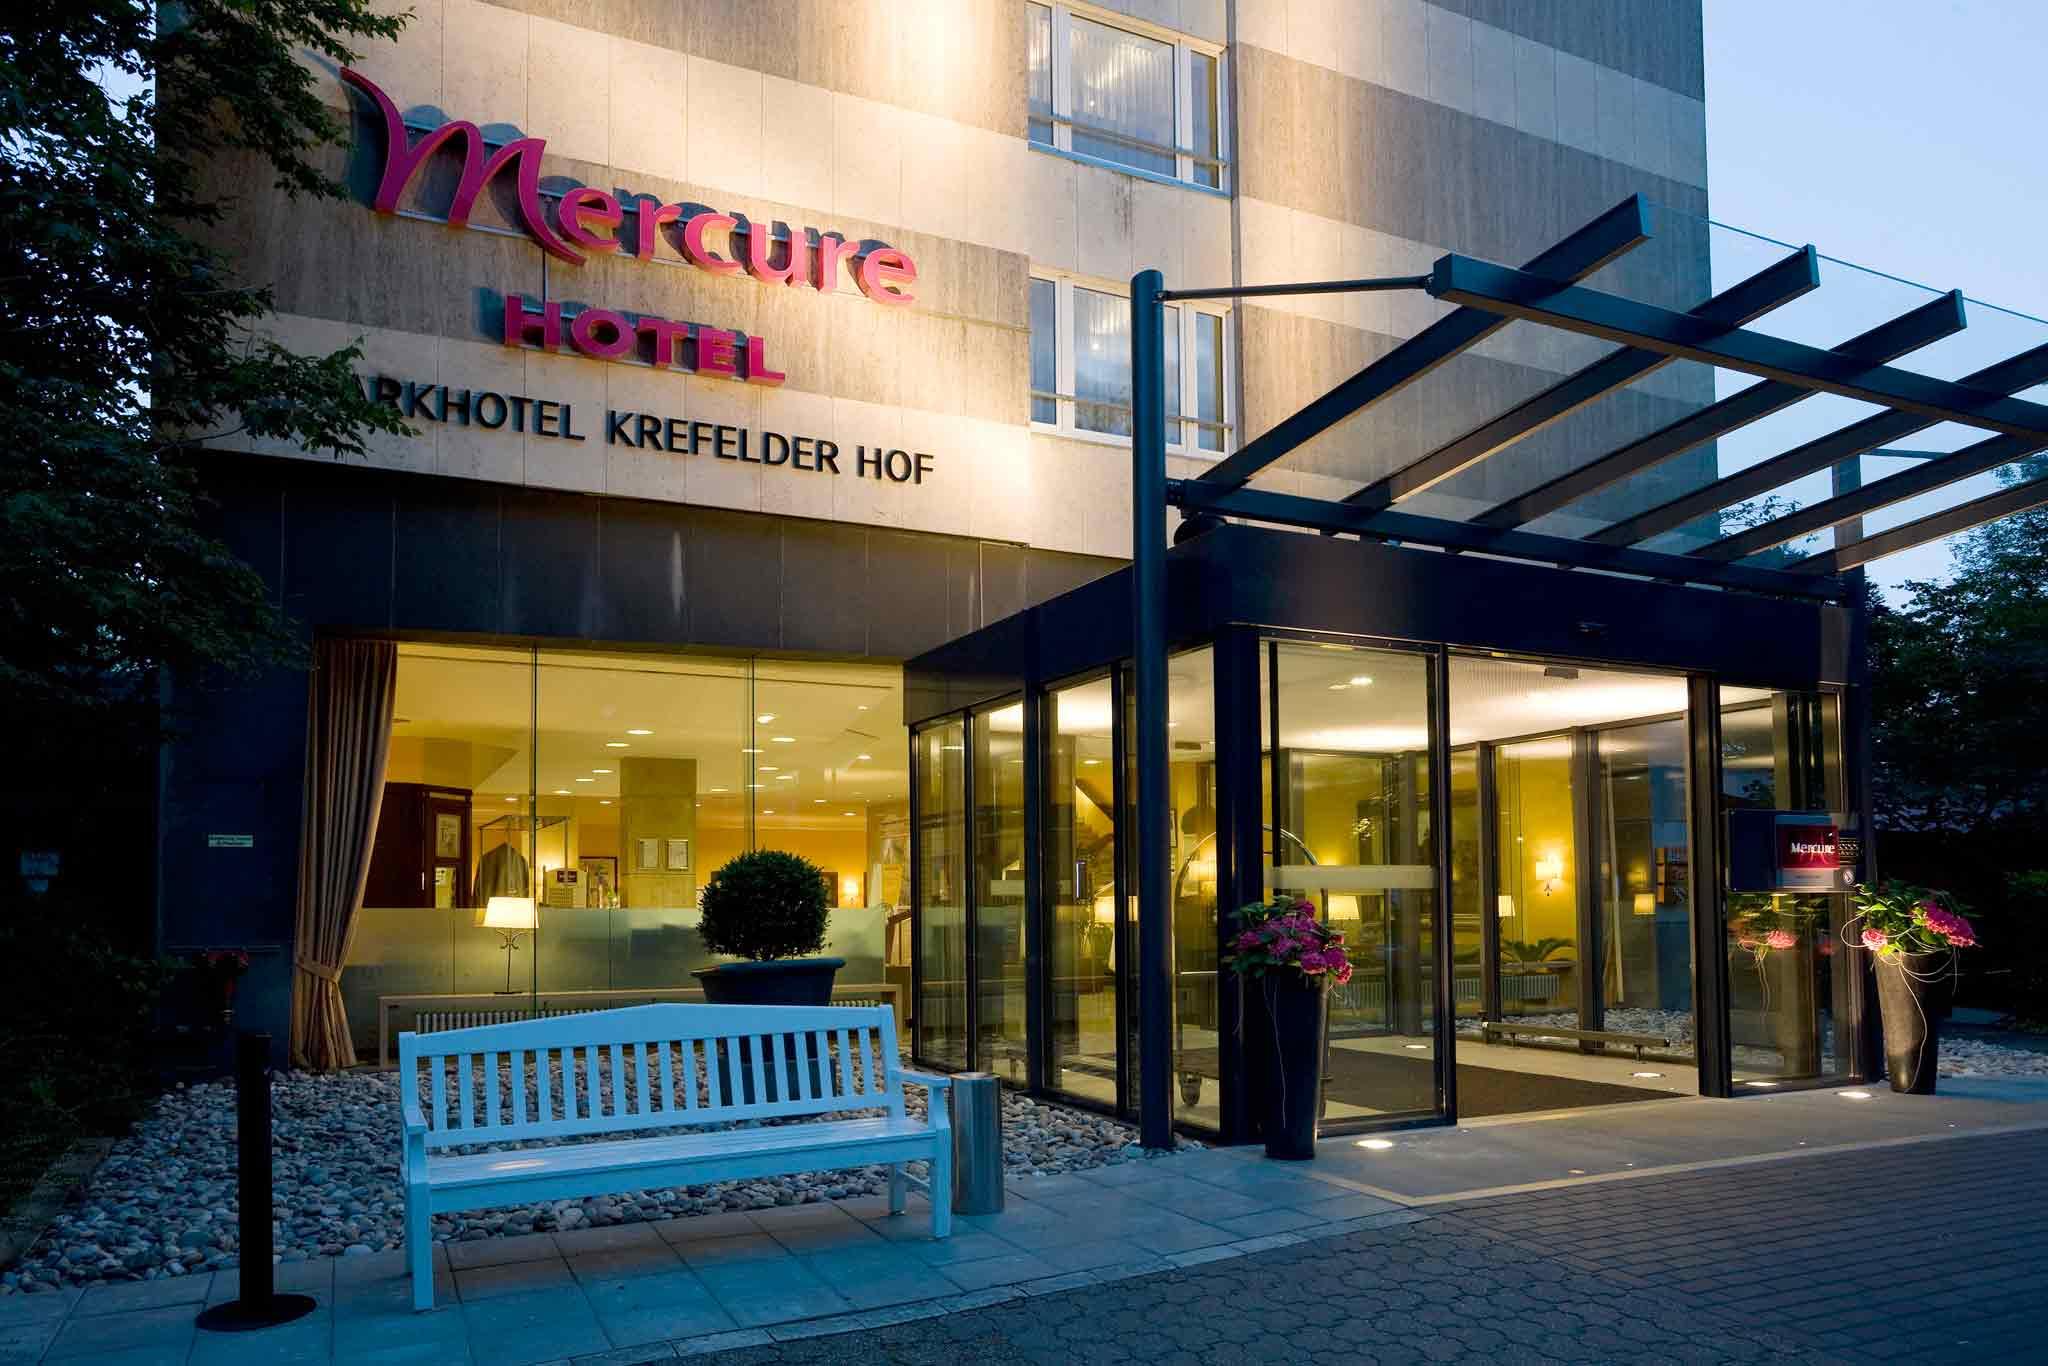 Mercure Parkhotel Krefelder Hof 外景